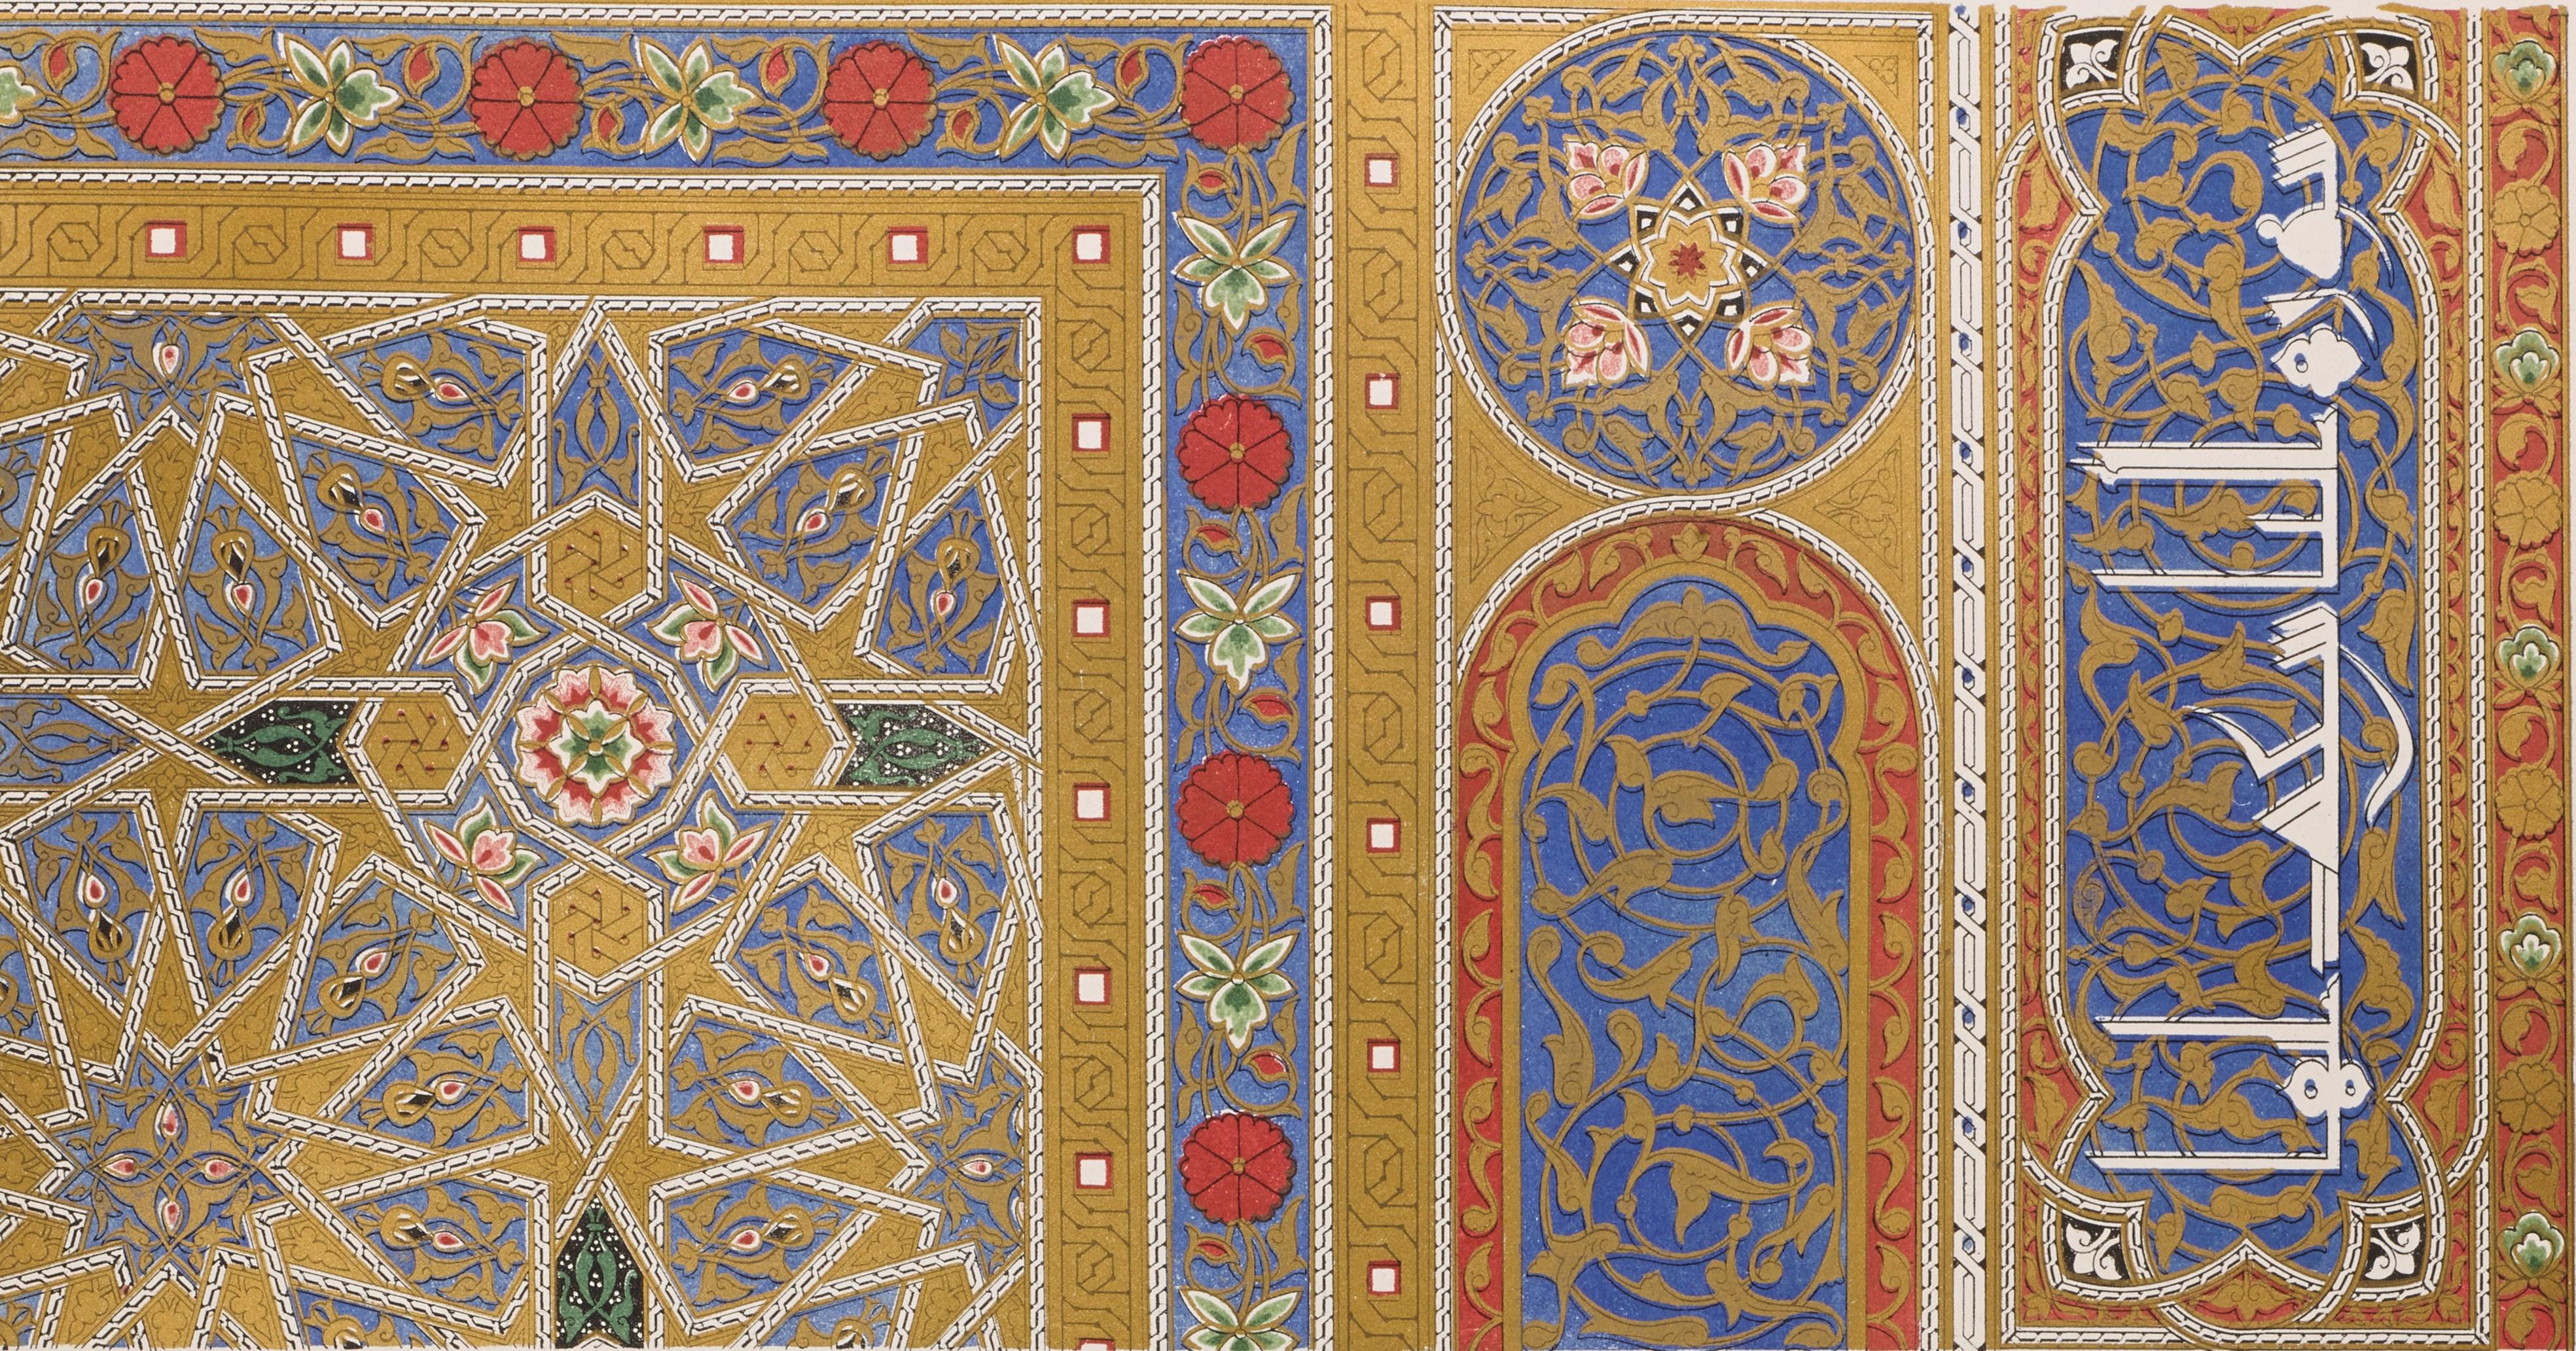 Antique 1856 ARABIAN DECORATIVE Art Chromolithograph Bookplate Owen Jones Grammar of ORNAMENT Print Interior Home Decor Design Reference